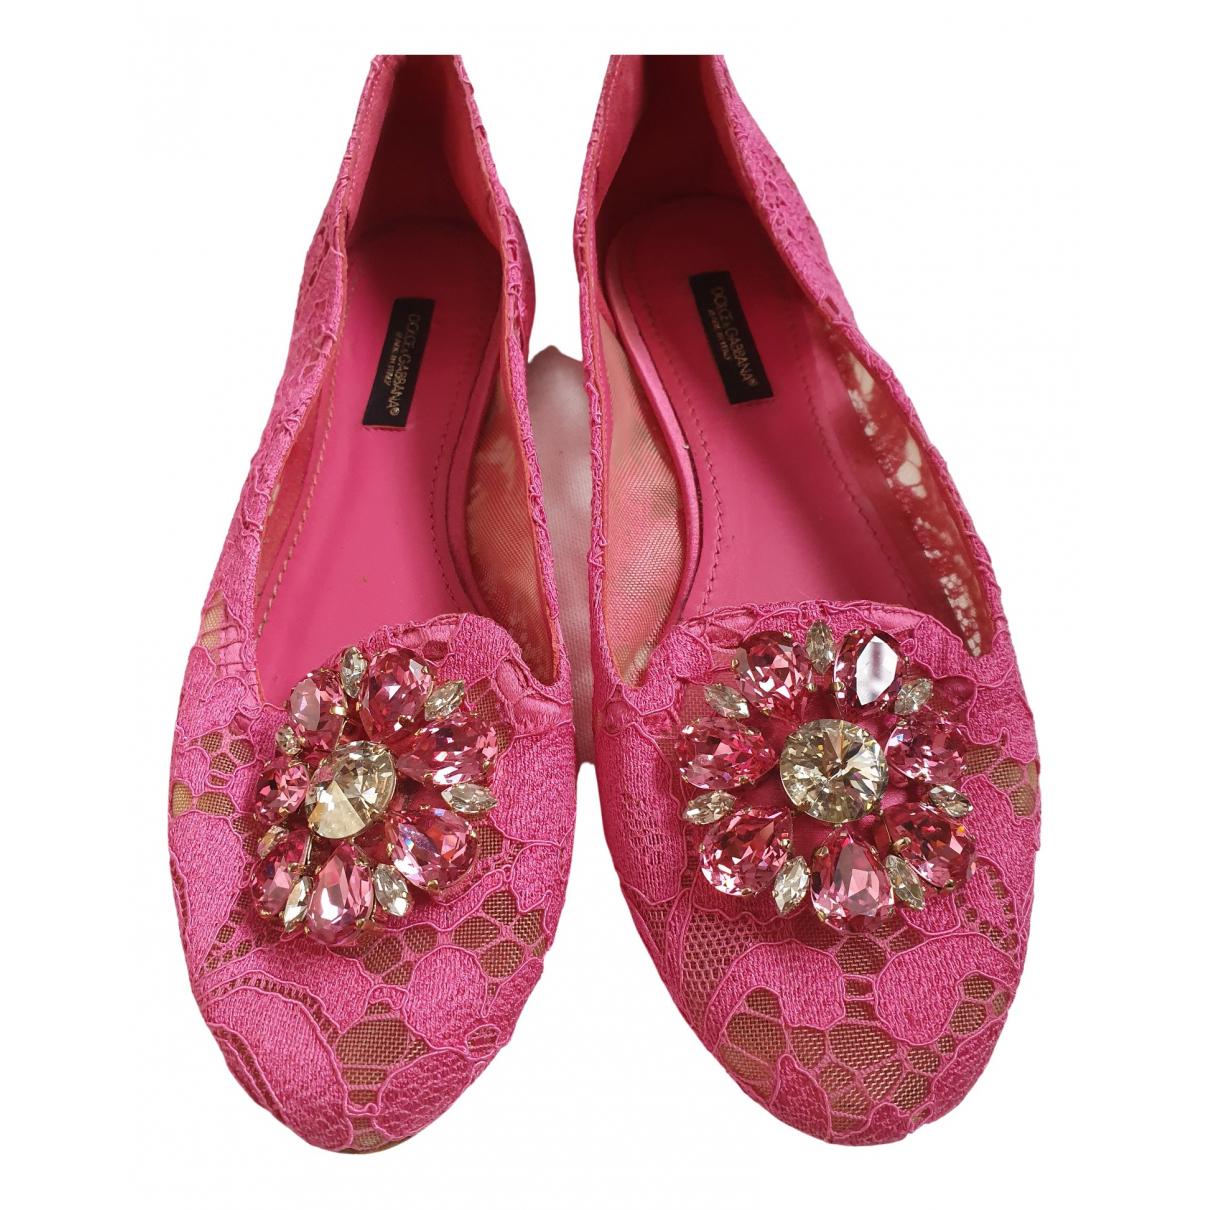 Dolce & Gabbana - Ballerines   pour femme en toile - rose